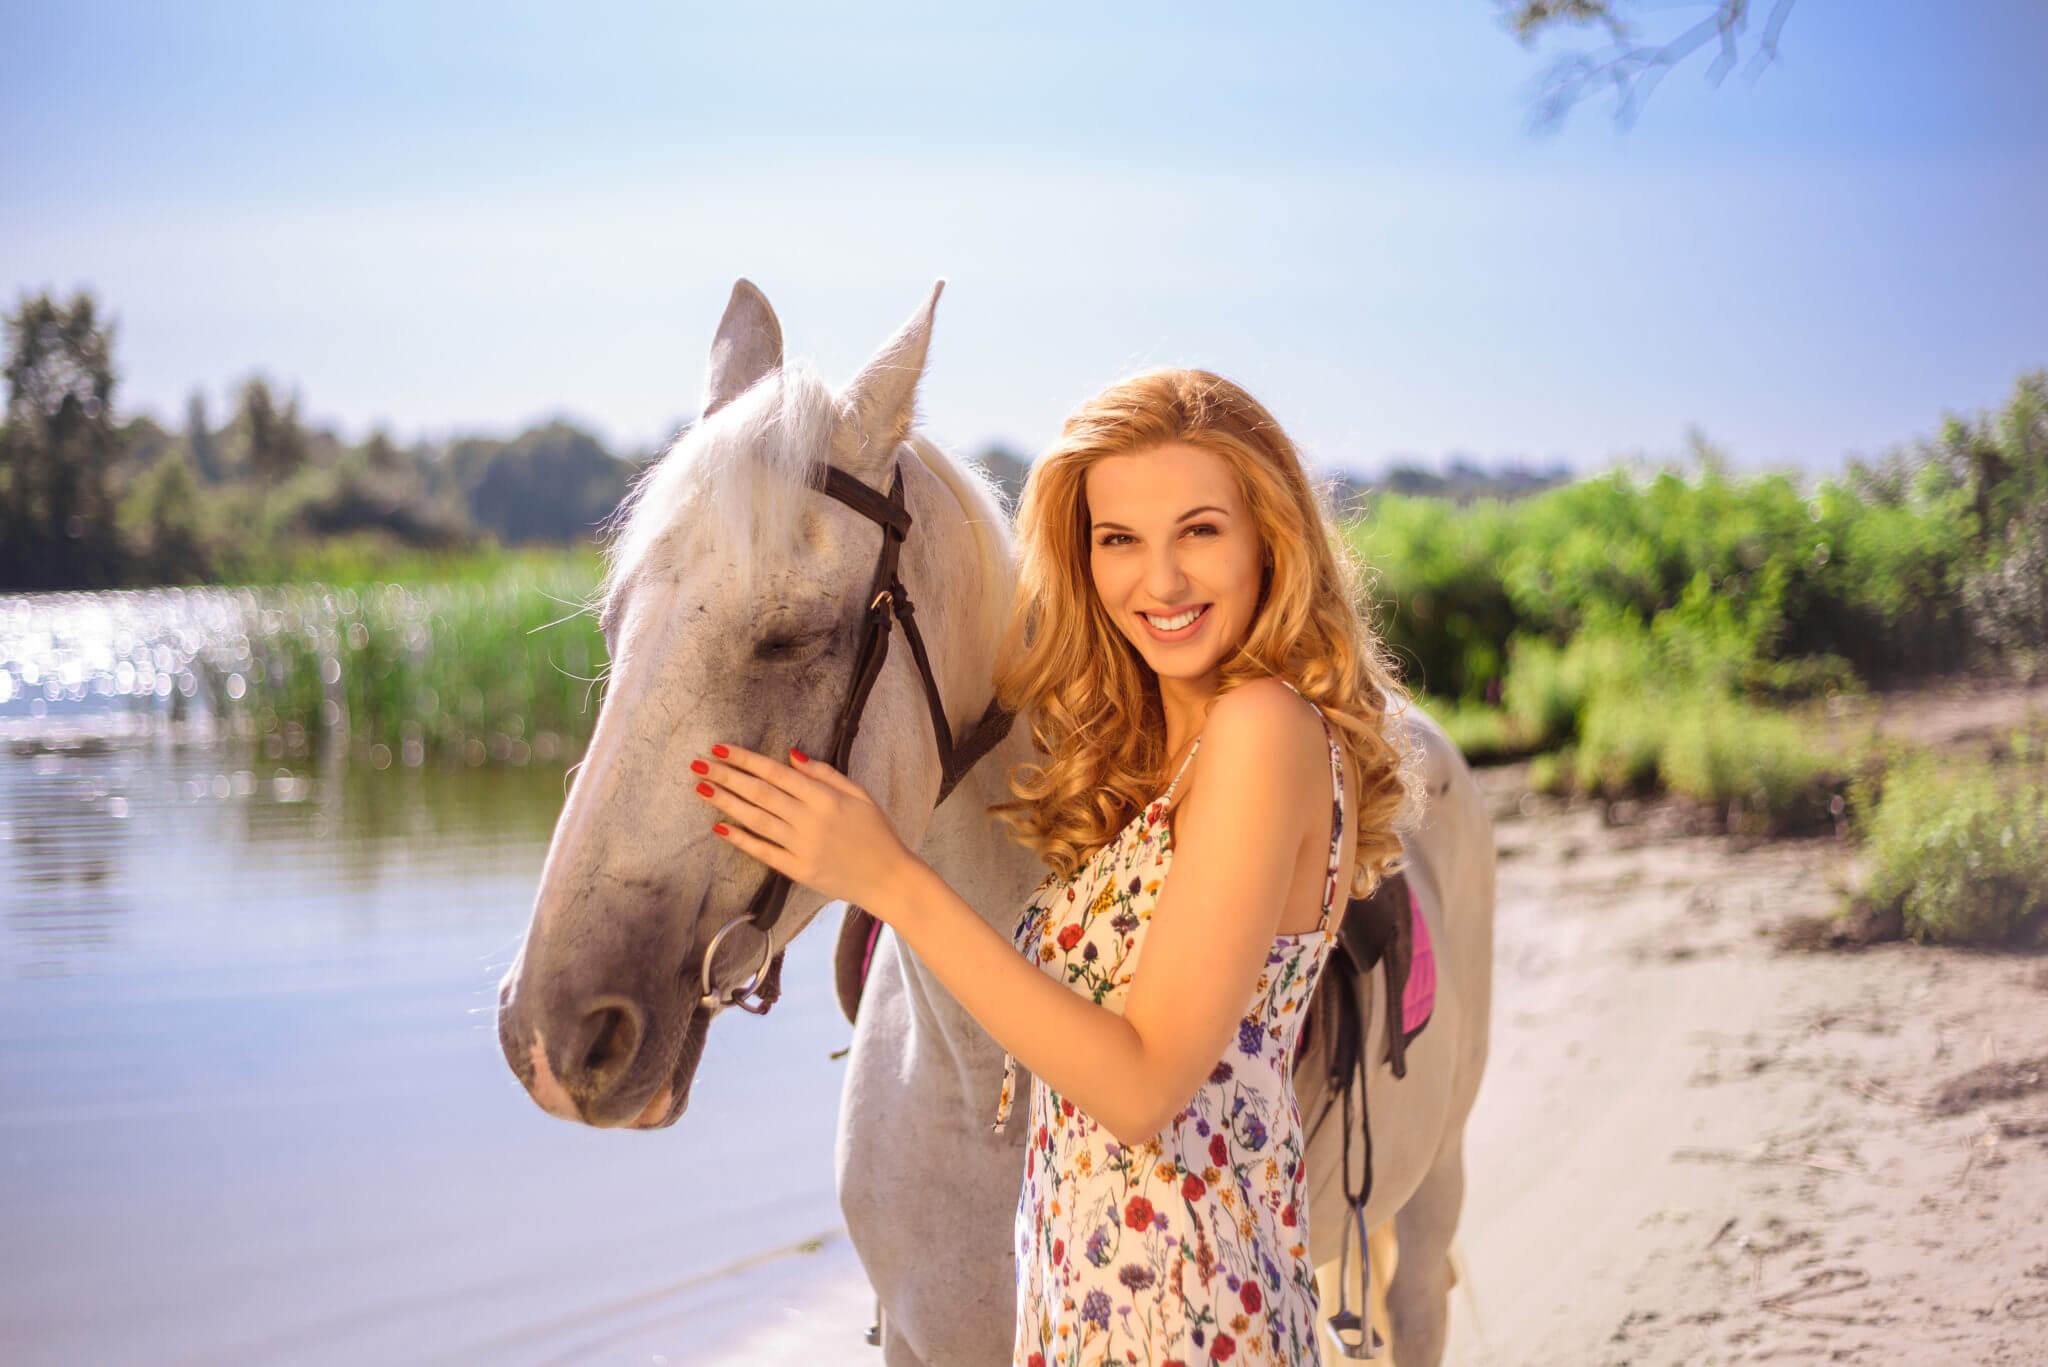 Фотосессия с лошадьми, ph Постникова Алиса, md Полина, локация Парк Дружбы Народов, лошадь Агата